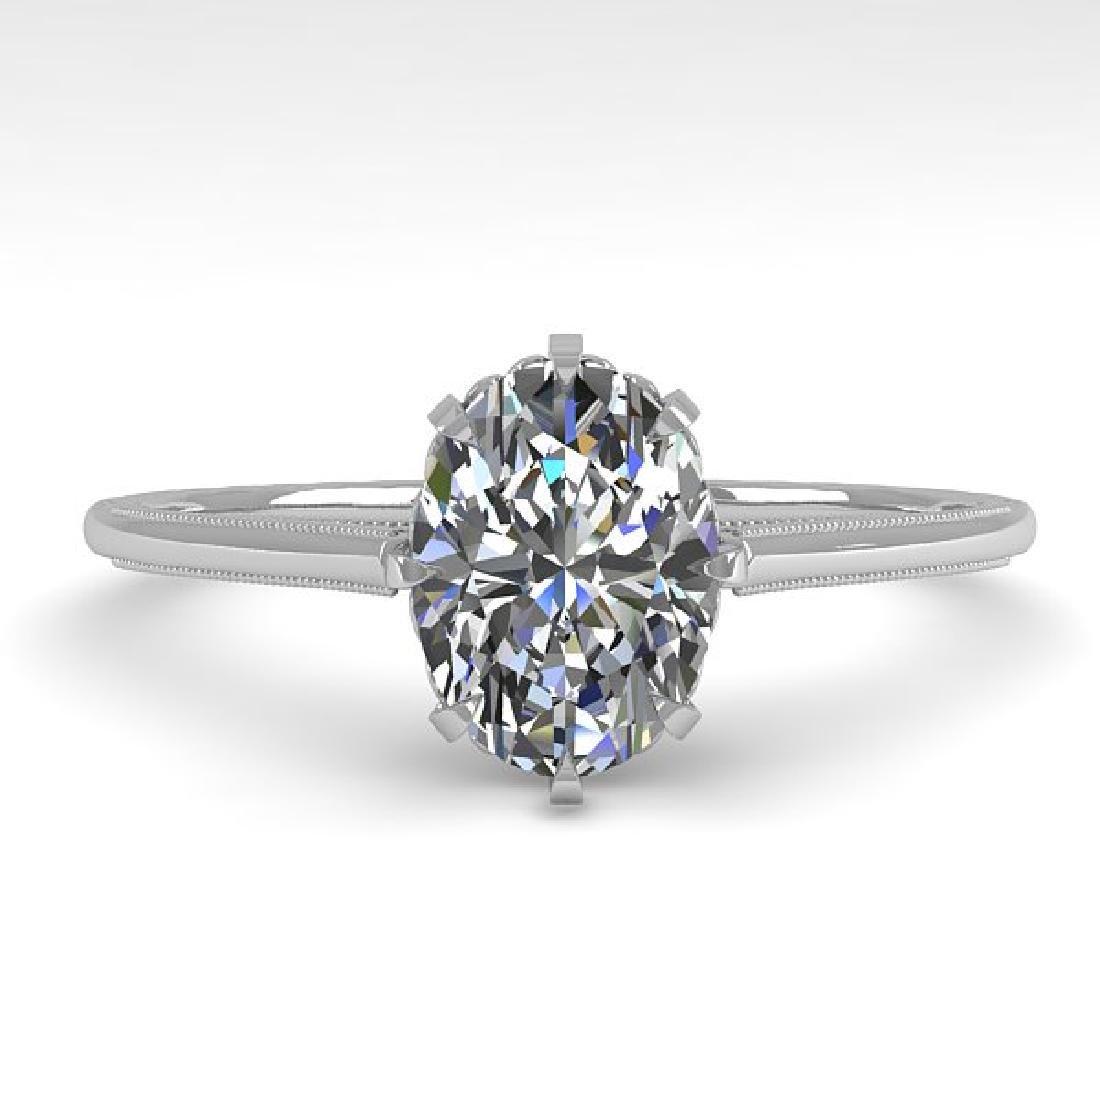 1.0 CTW VS/SI Oval Diamond Solitaire Ring 14K White